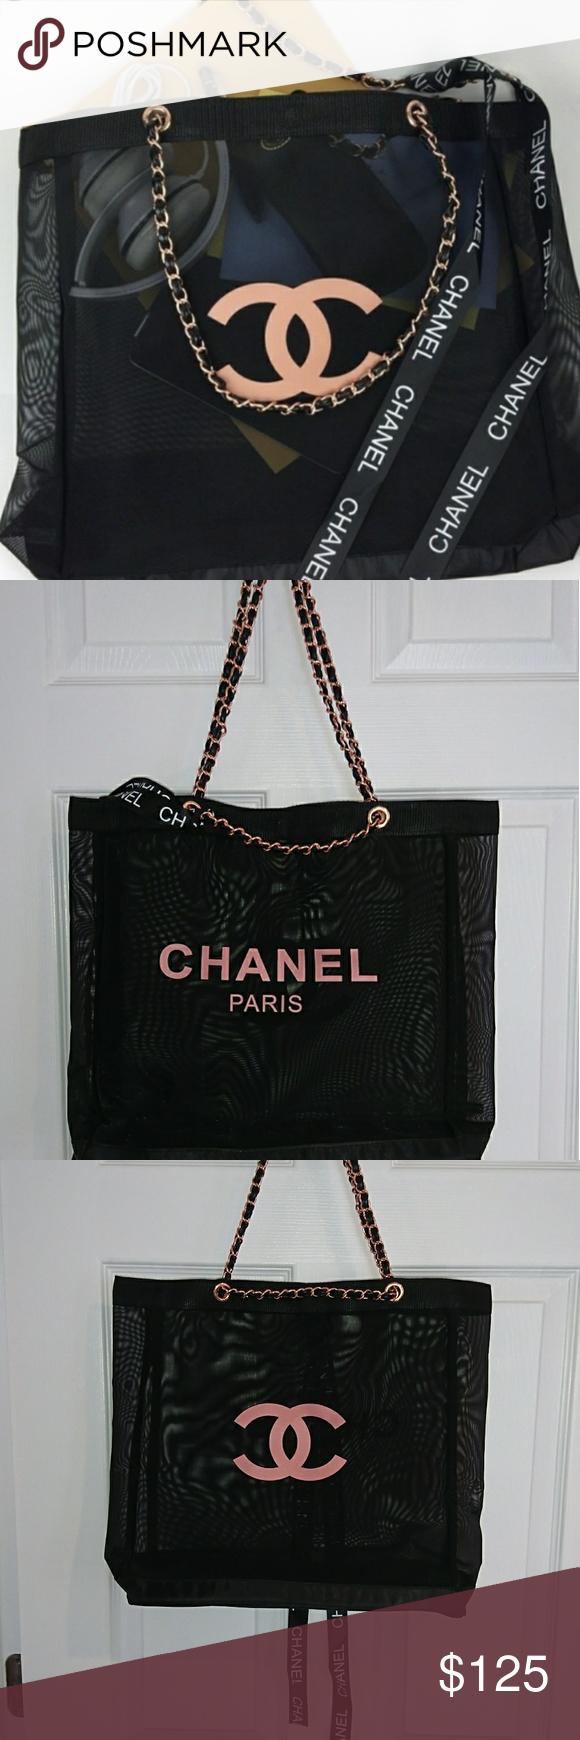 f7515260dd2ff3 Flash sale 🆕 Authentic chanel vip rose gold tote 🆕 Authentic chanel vip  gift Not for